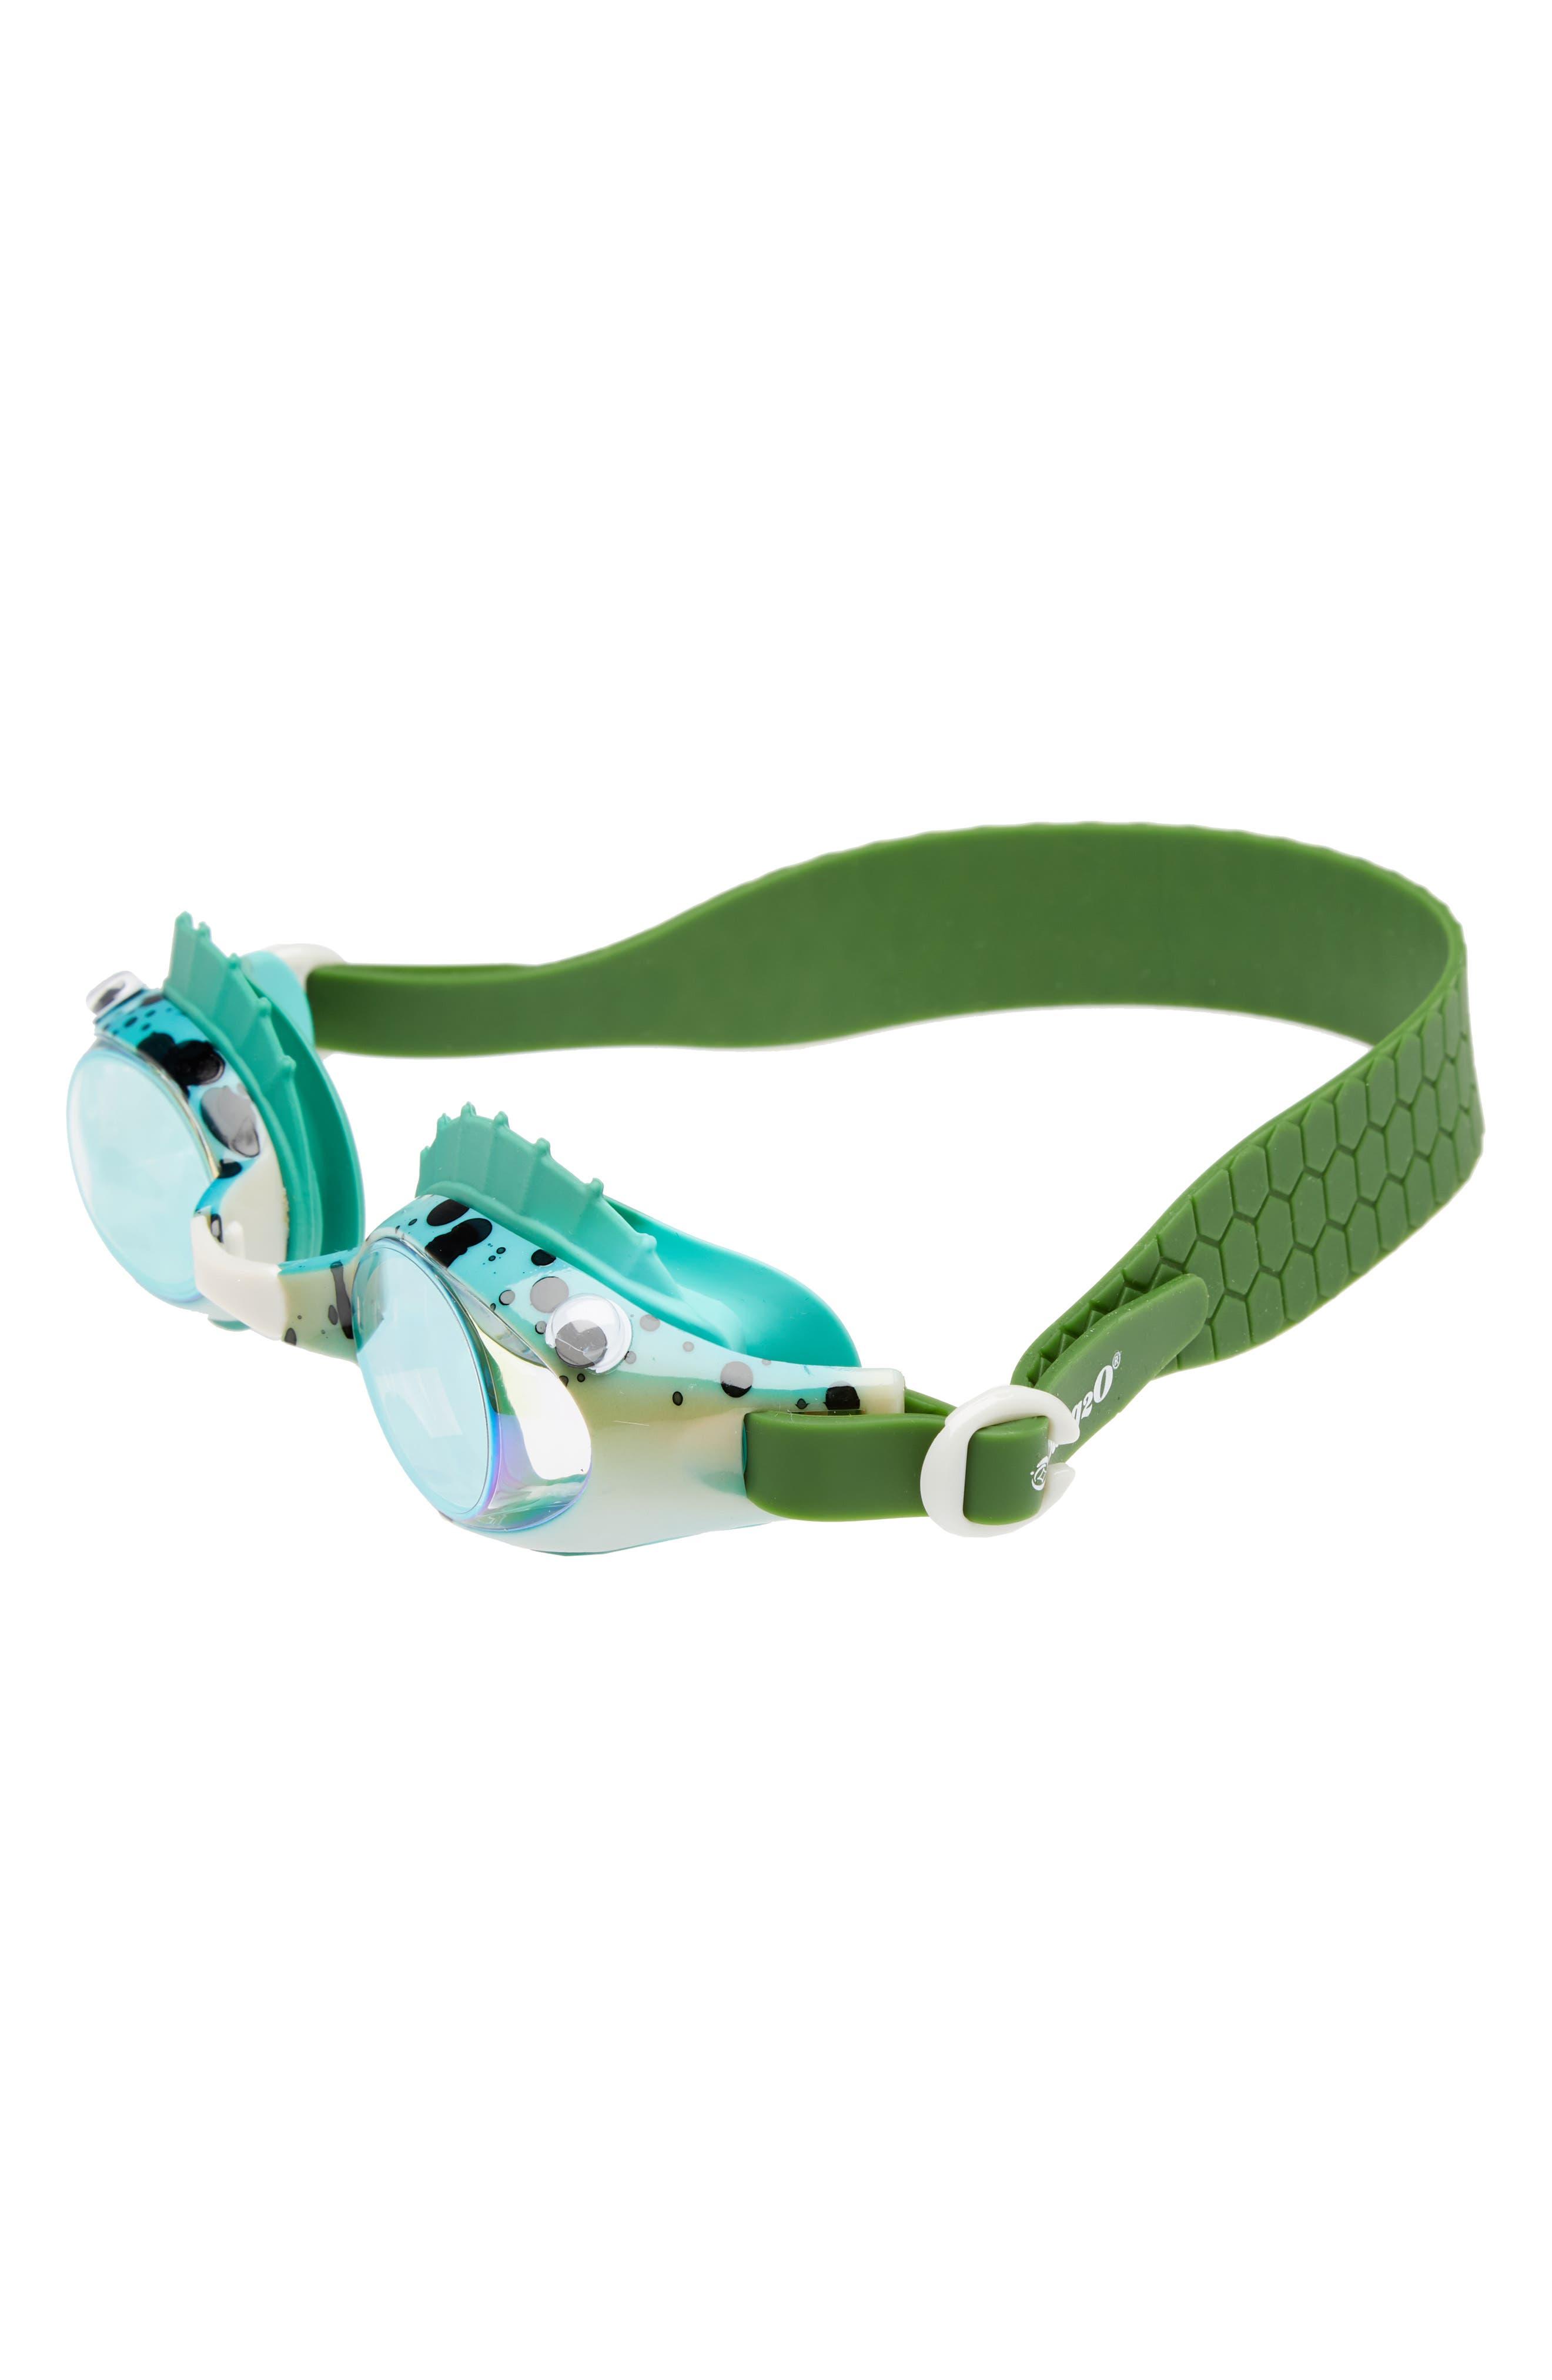 Lizard Swim Goggles,                             Main thumbnail 1, color,                             300